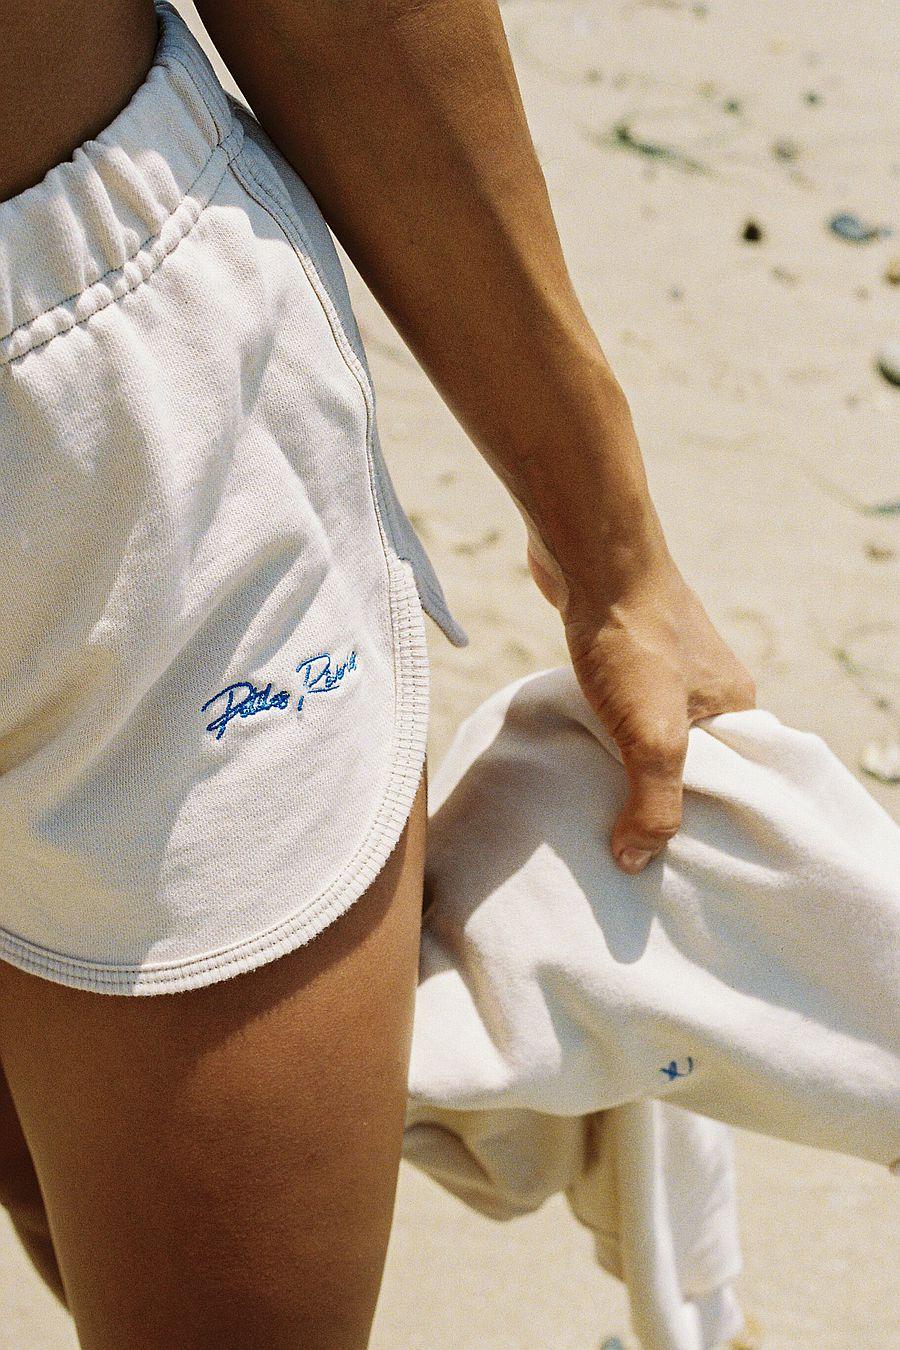 Petites Reveries Dolphin Shorts   Cream & Blue